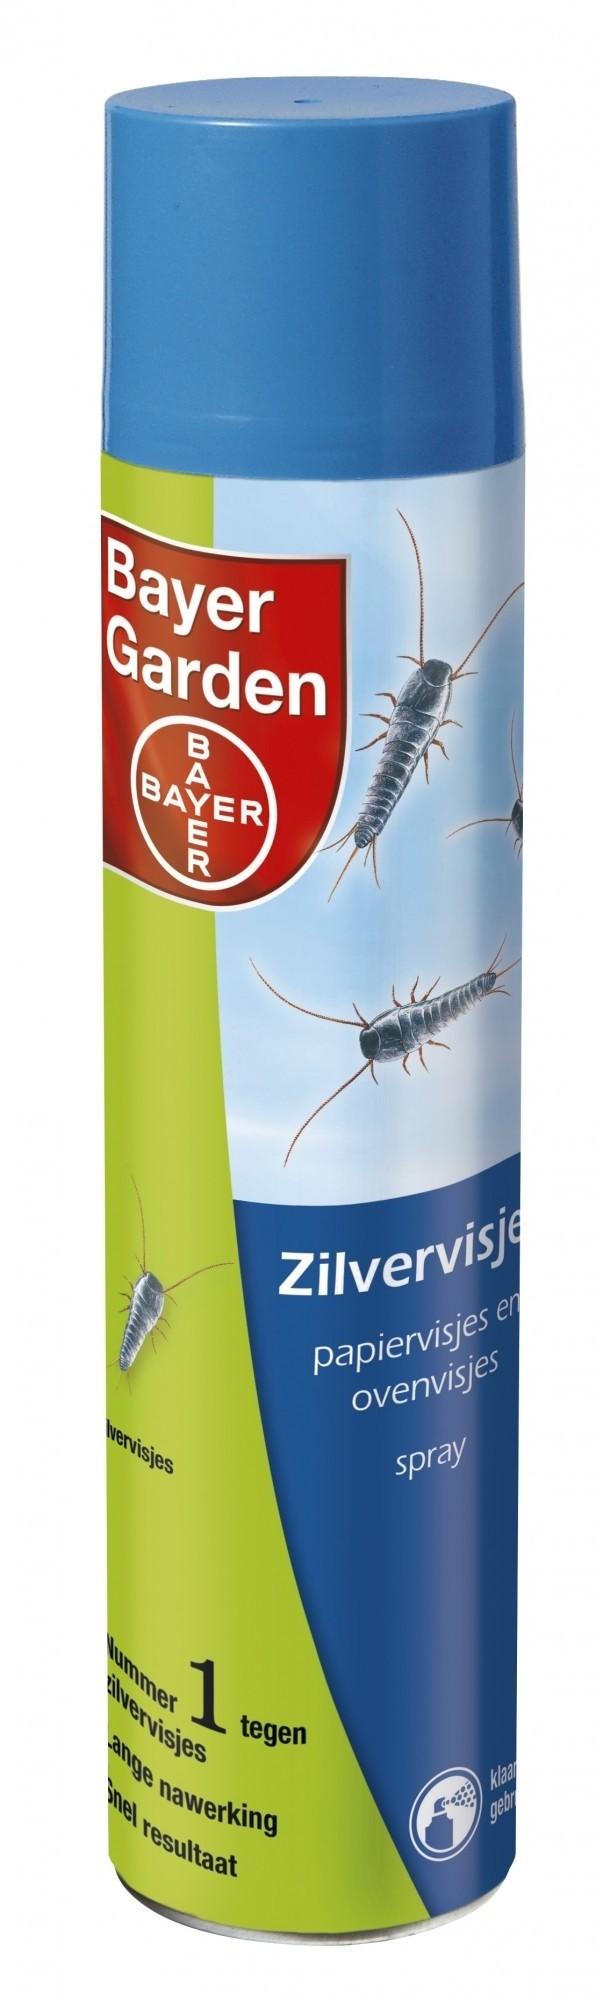 Zilvervisjesspray Bayer 400ml